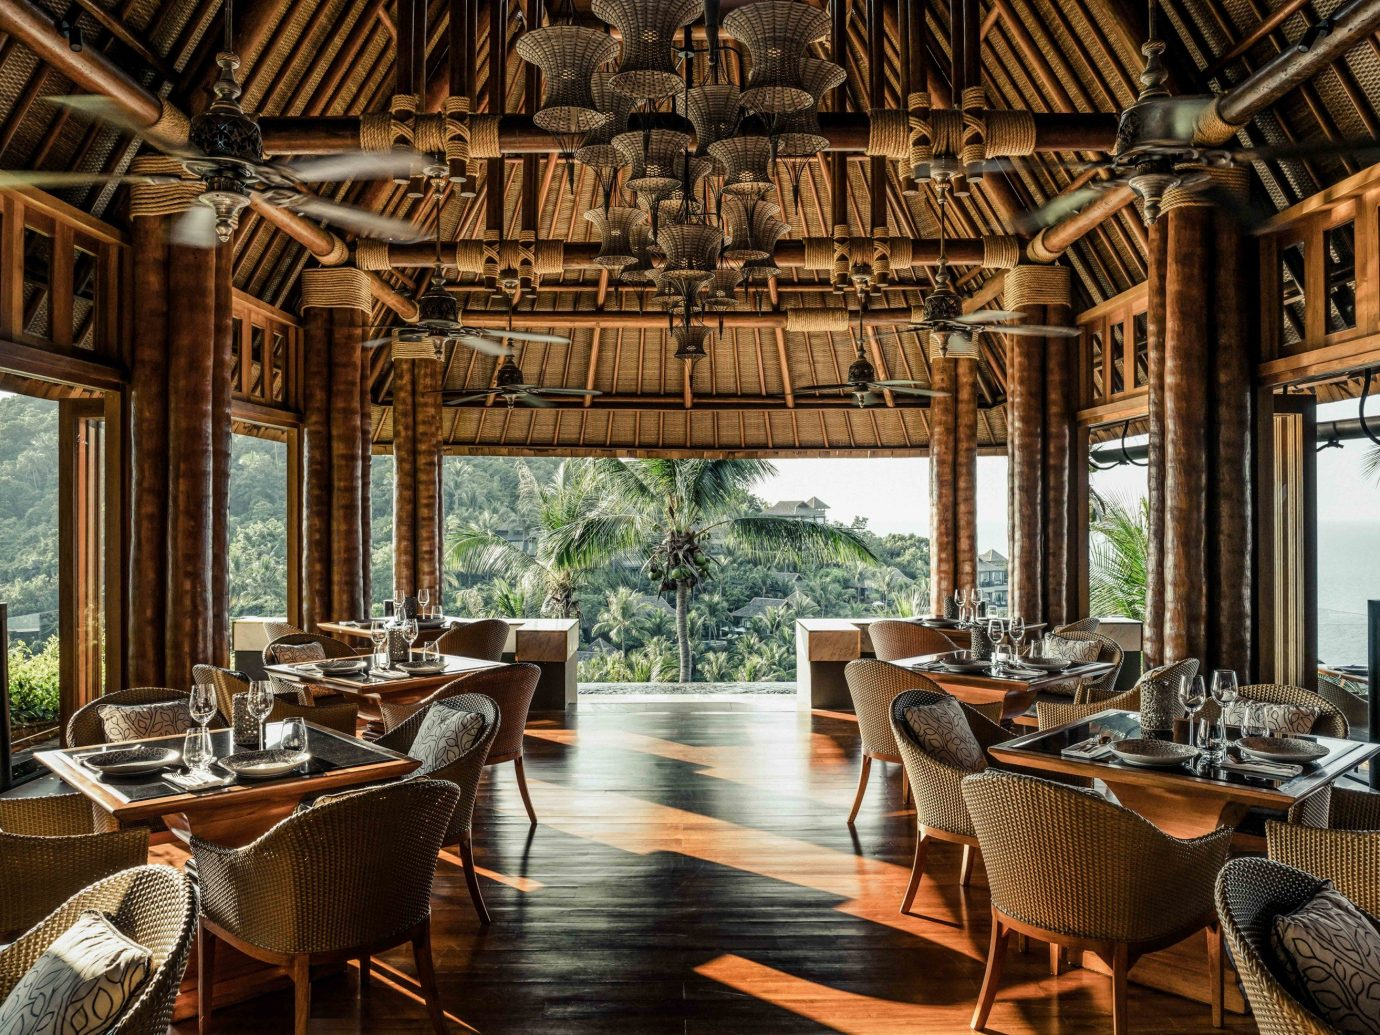 Hotels table indoor chair window room restaurant Dining interior design Resort furniture set several dining table